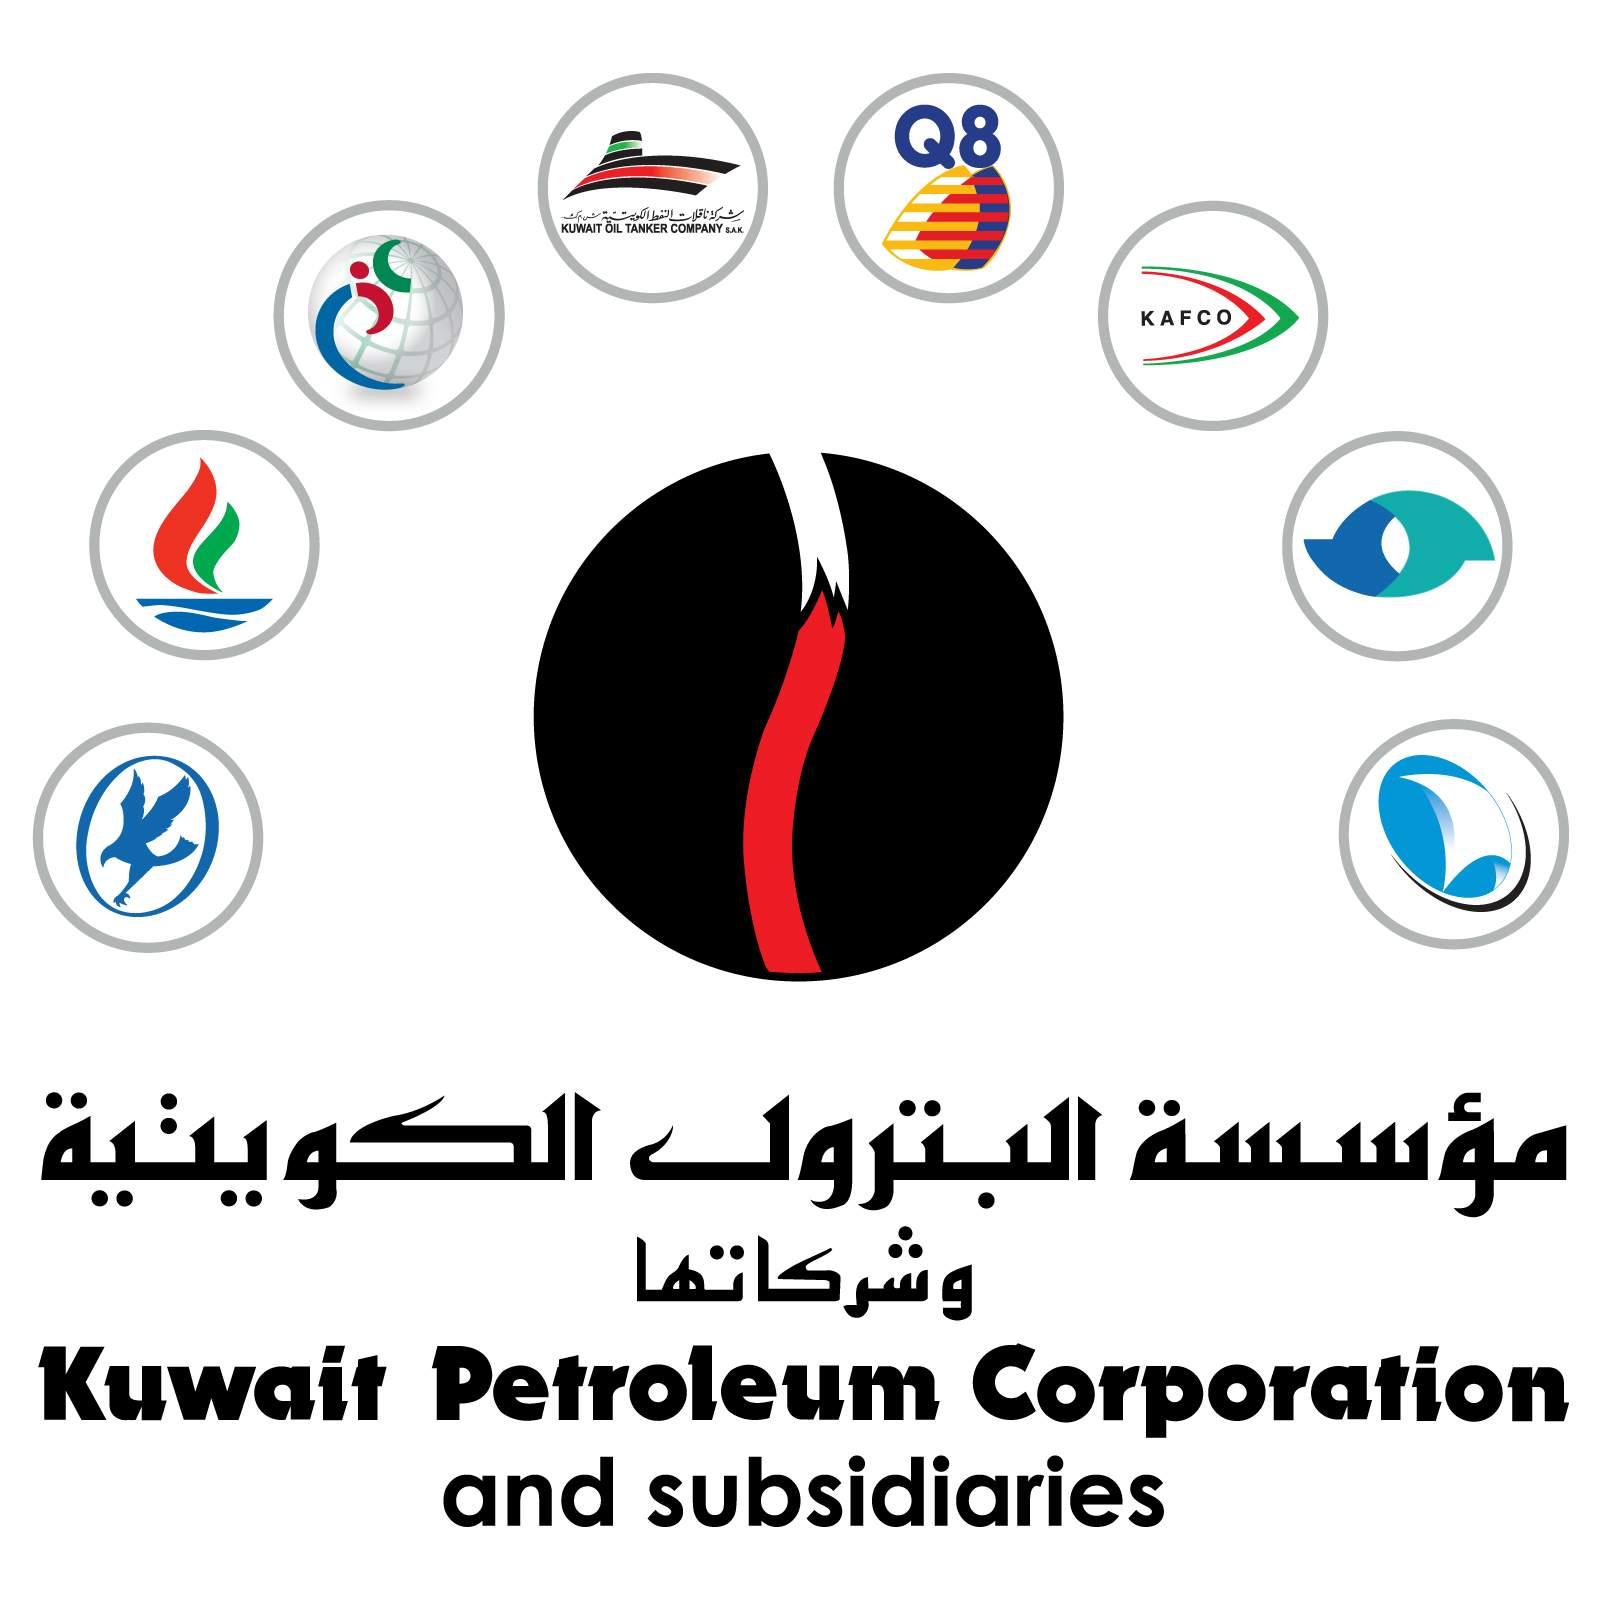 KPC Subsidiaries half circle logo 2015 (2)-compres